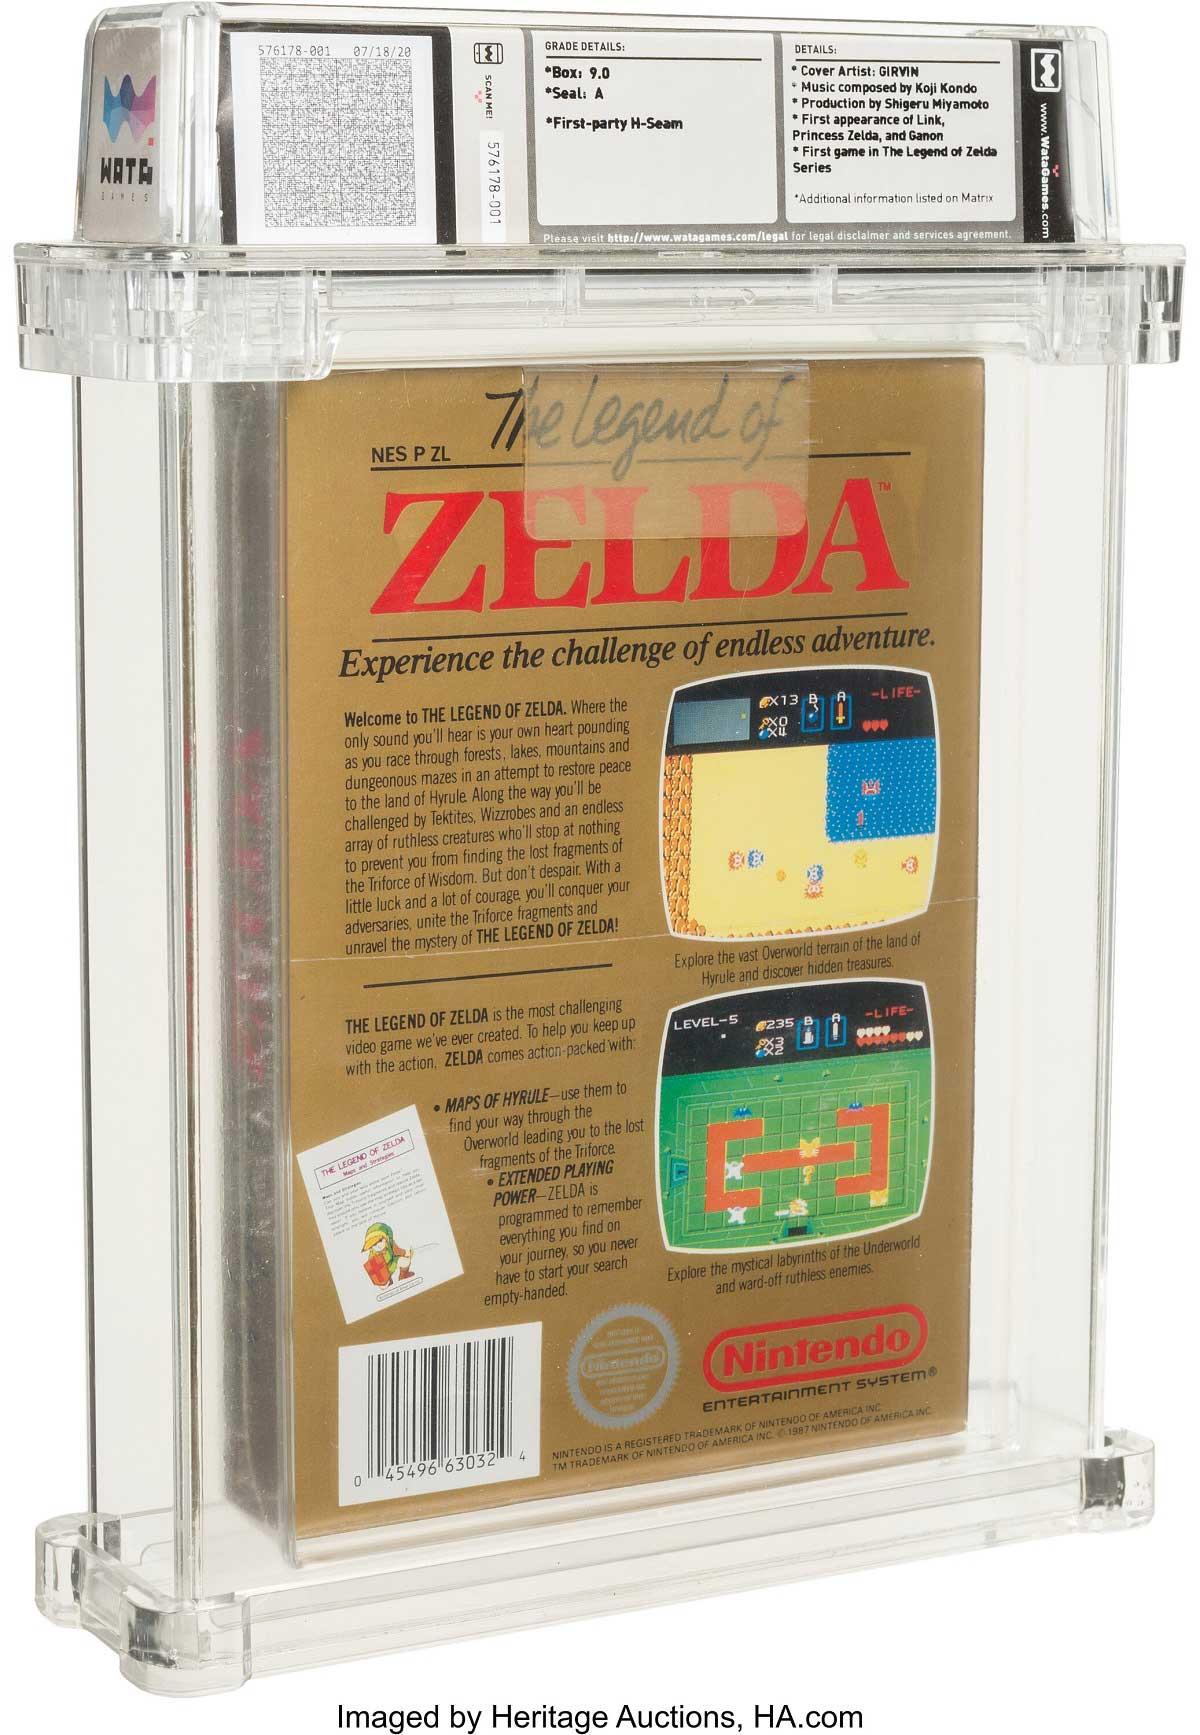 Heritage Auctions: The legend of Zelda NES back